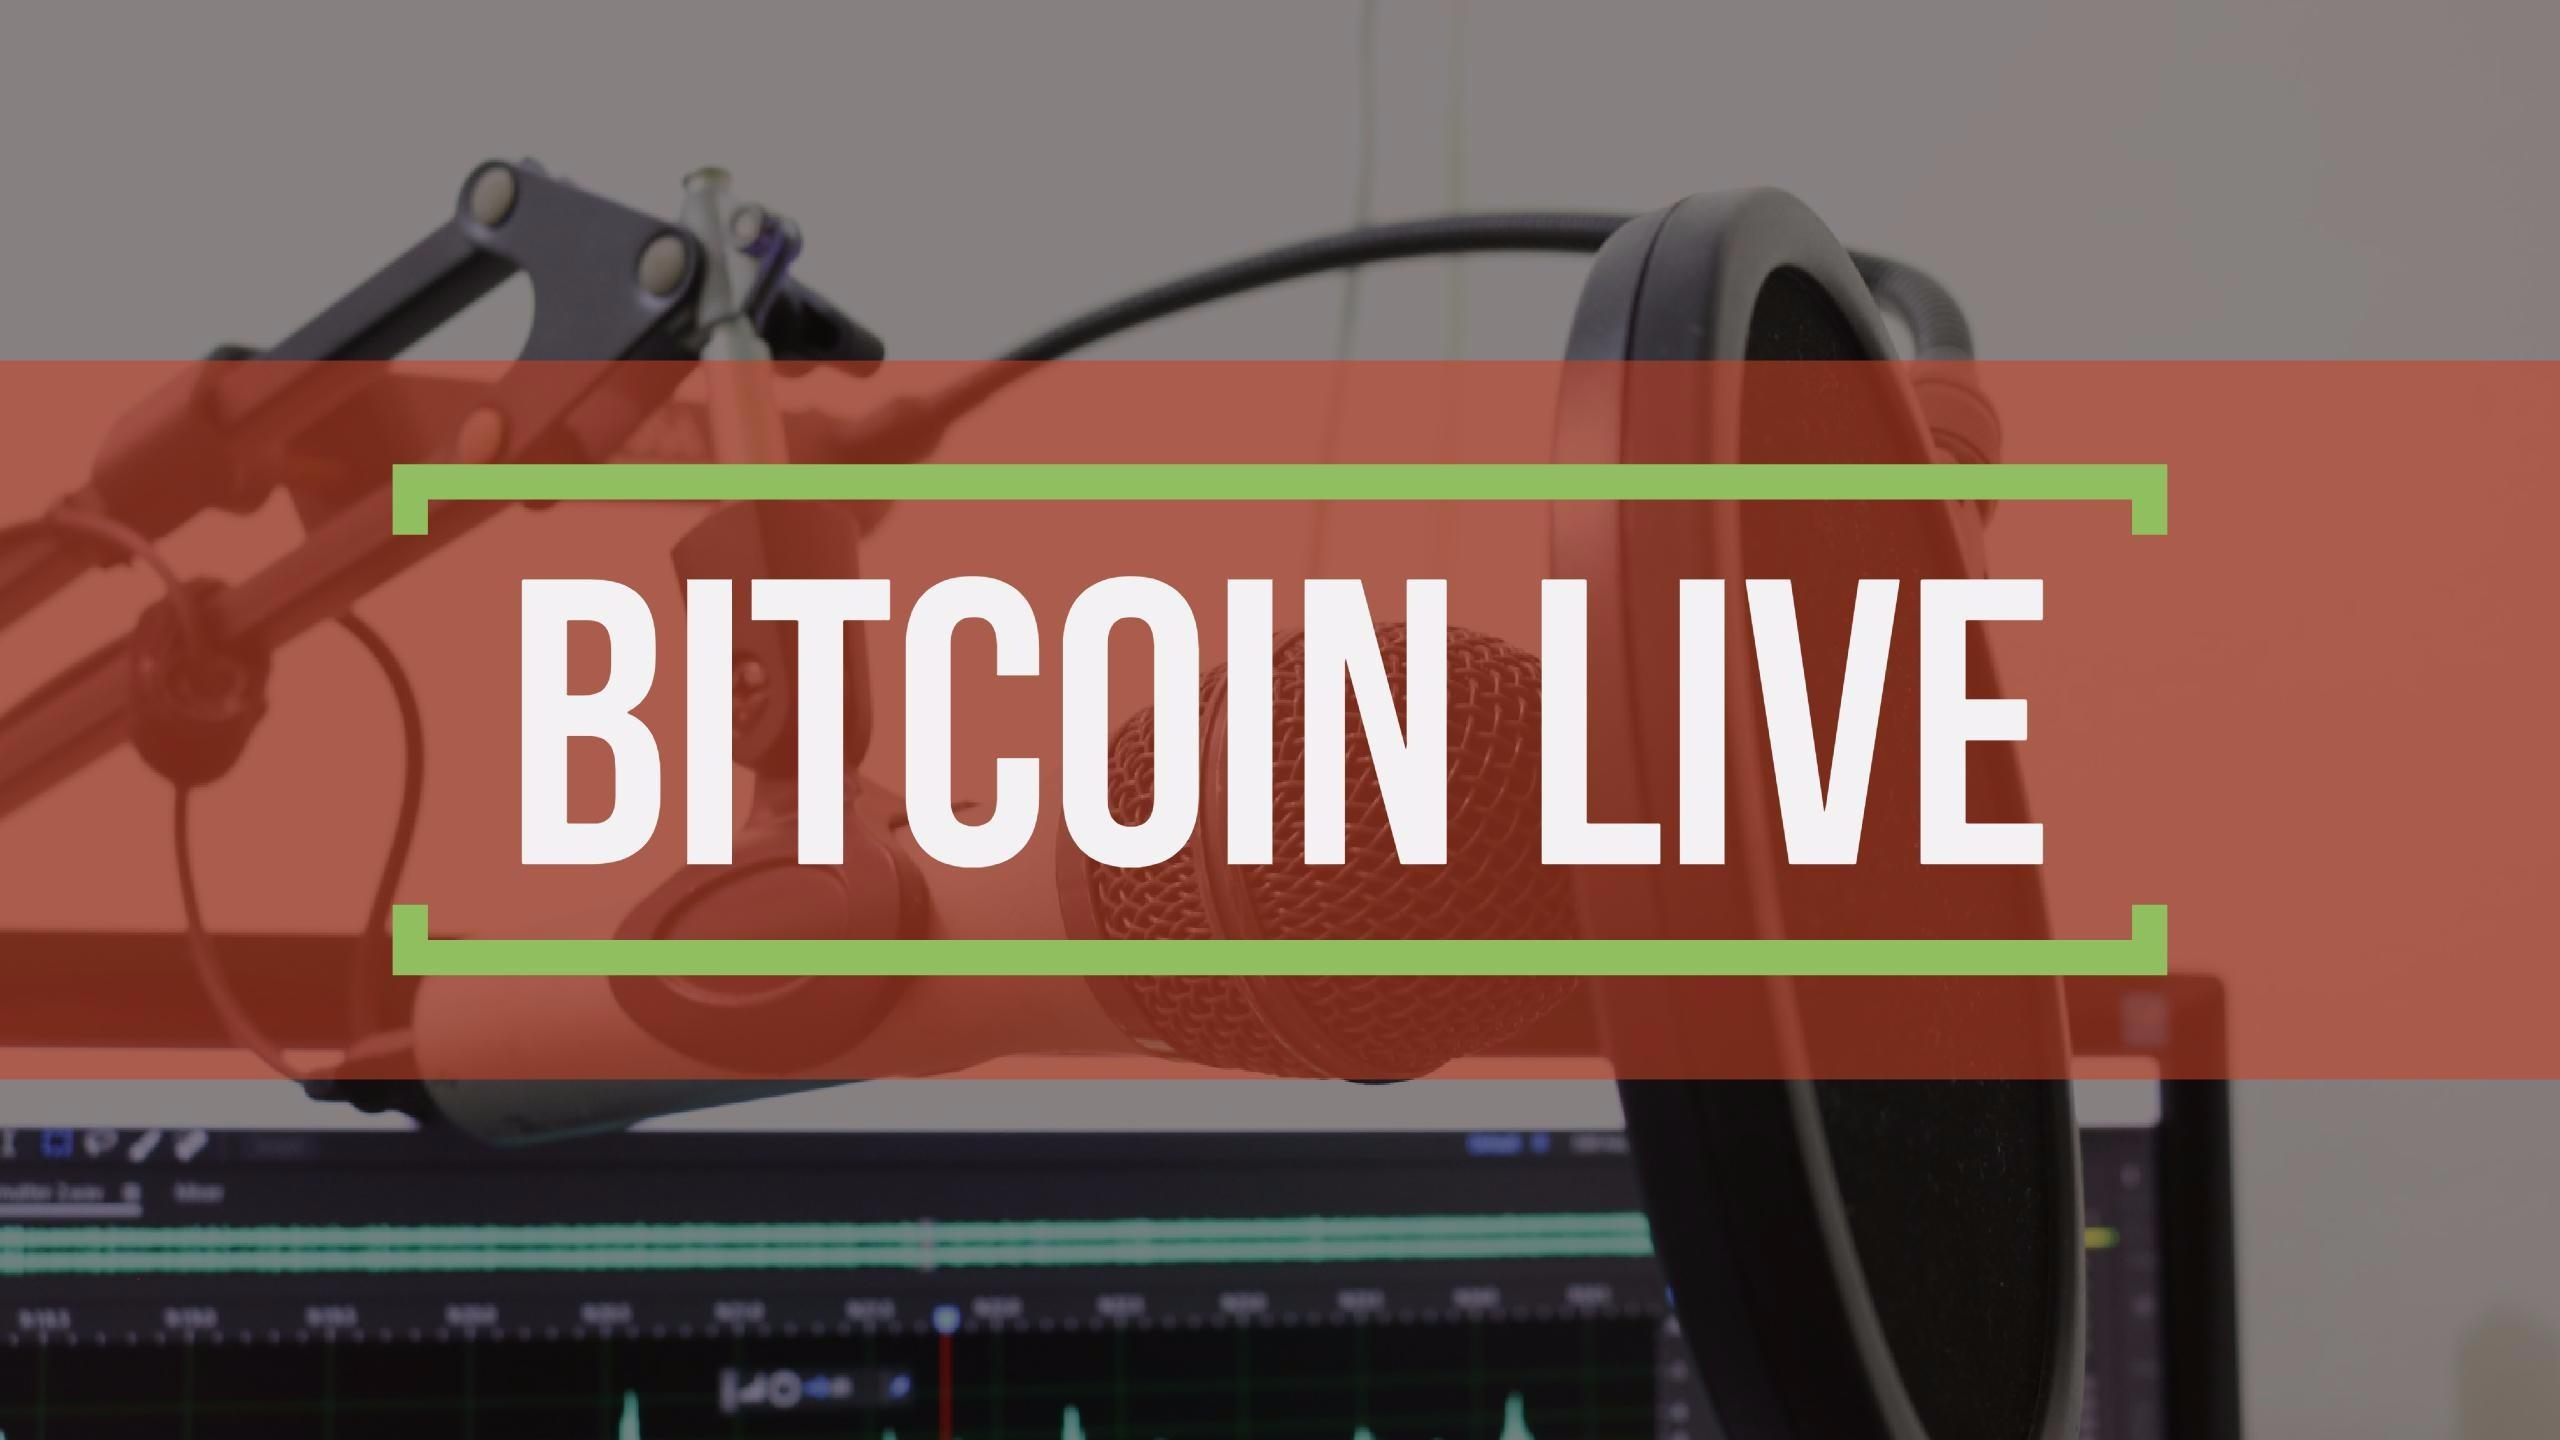 Bitcoinで投げ銭を!! ビットコイン/仮想通貨×視聴料 心付×ライブ動画配信